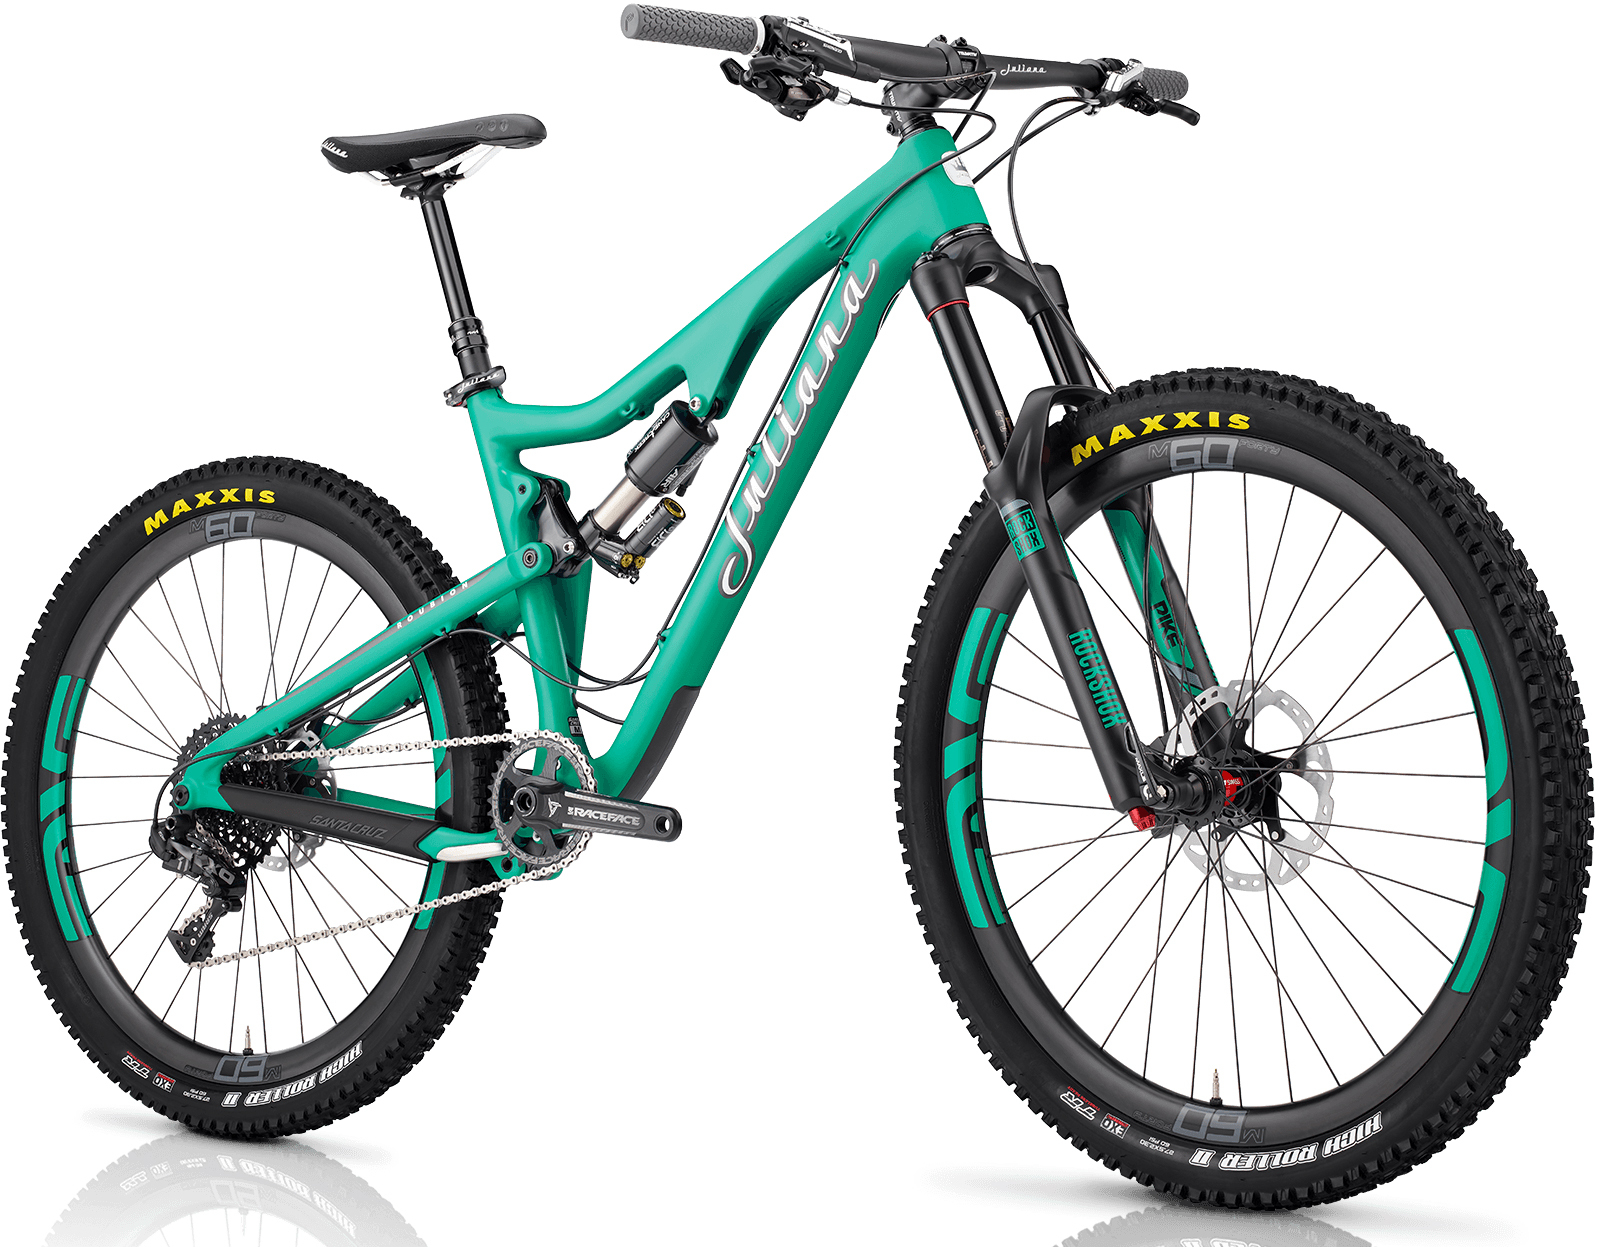 2bd1584621 Uma mountain bike só para mulheres - Go Outside